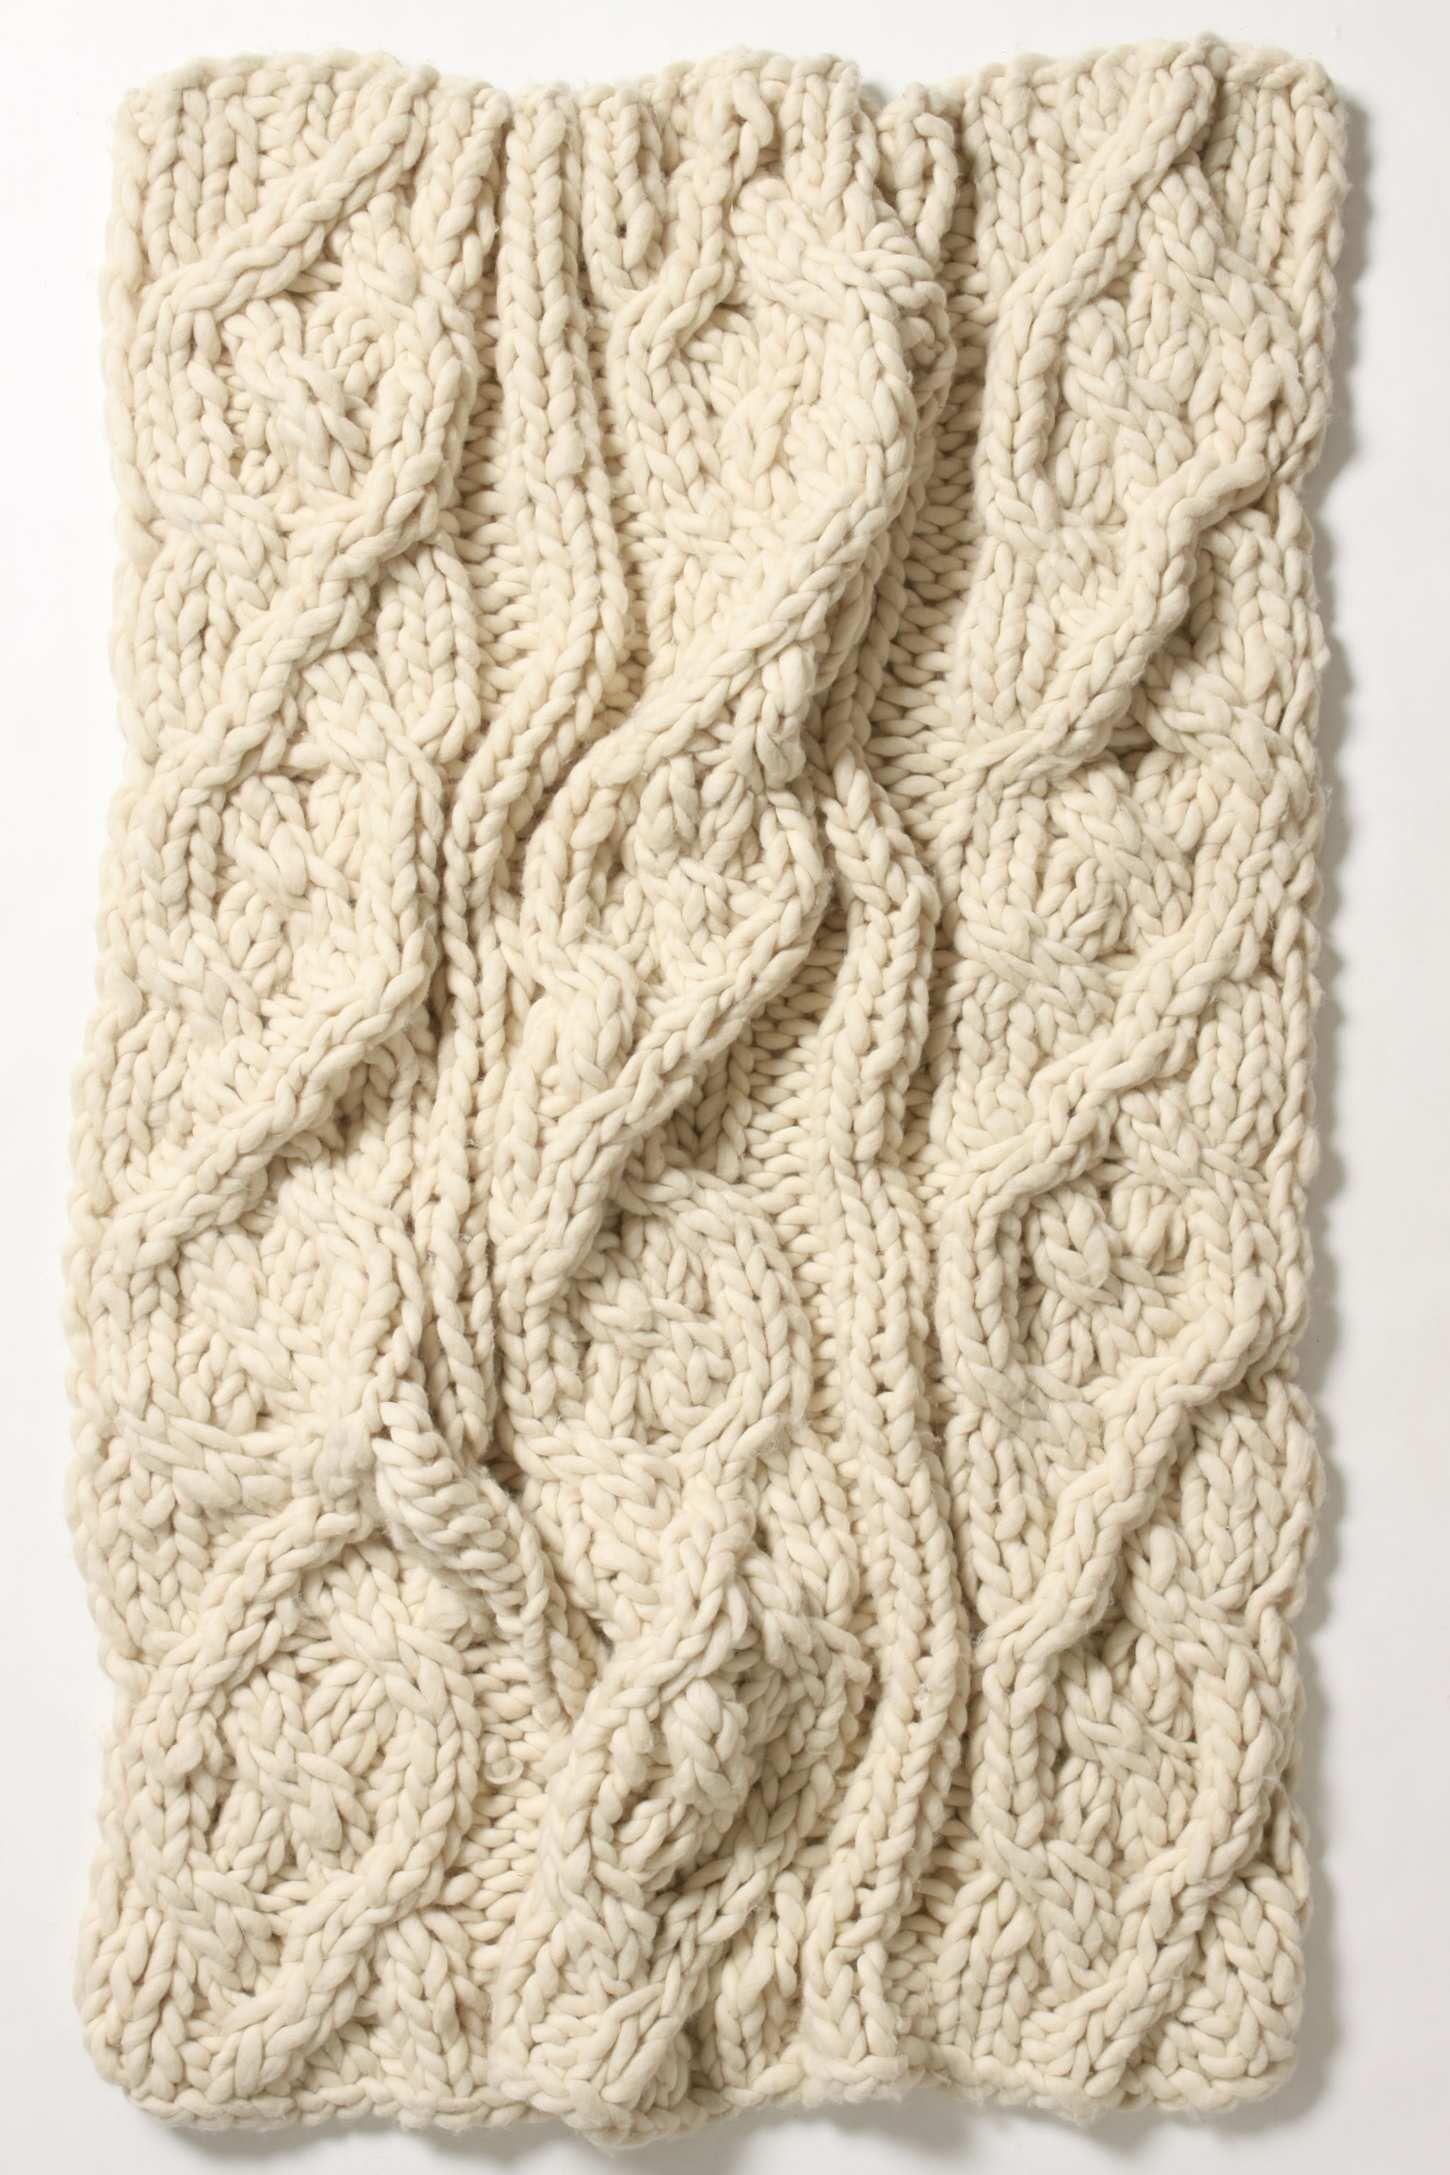 cable knit | Cable | Pinterest | Dos agujas, Puntadas y Manta